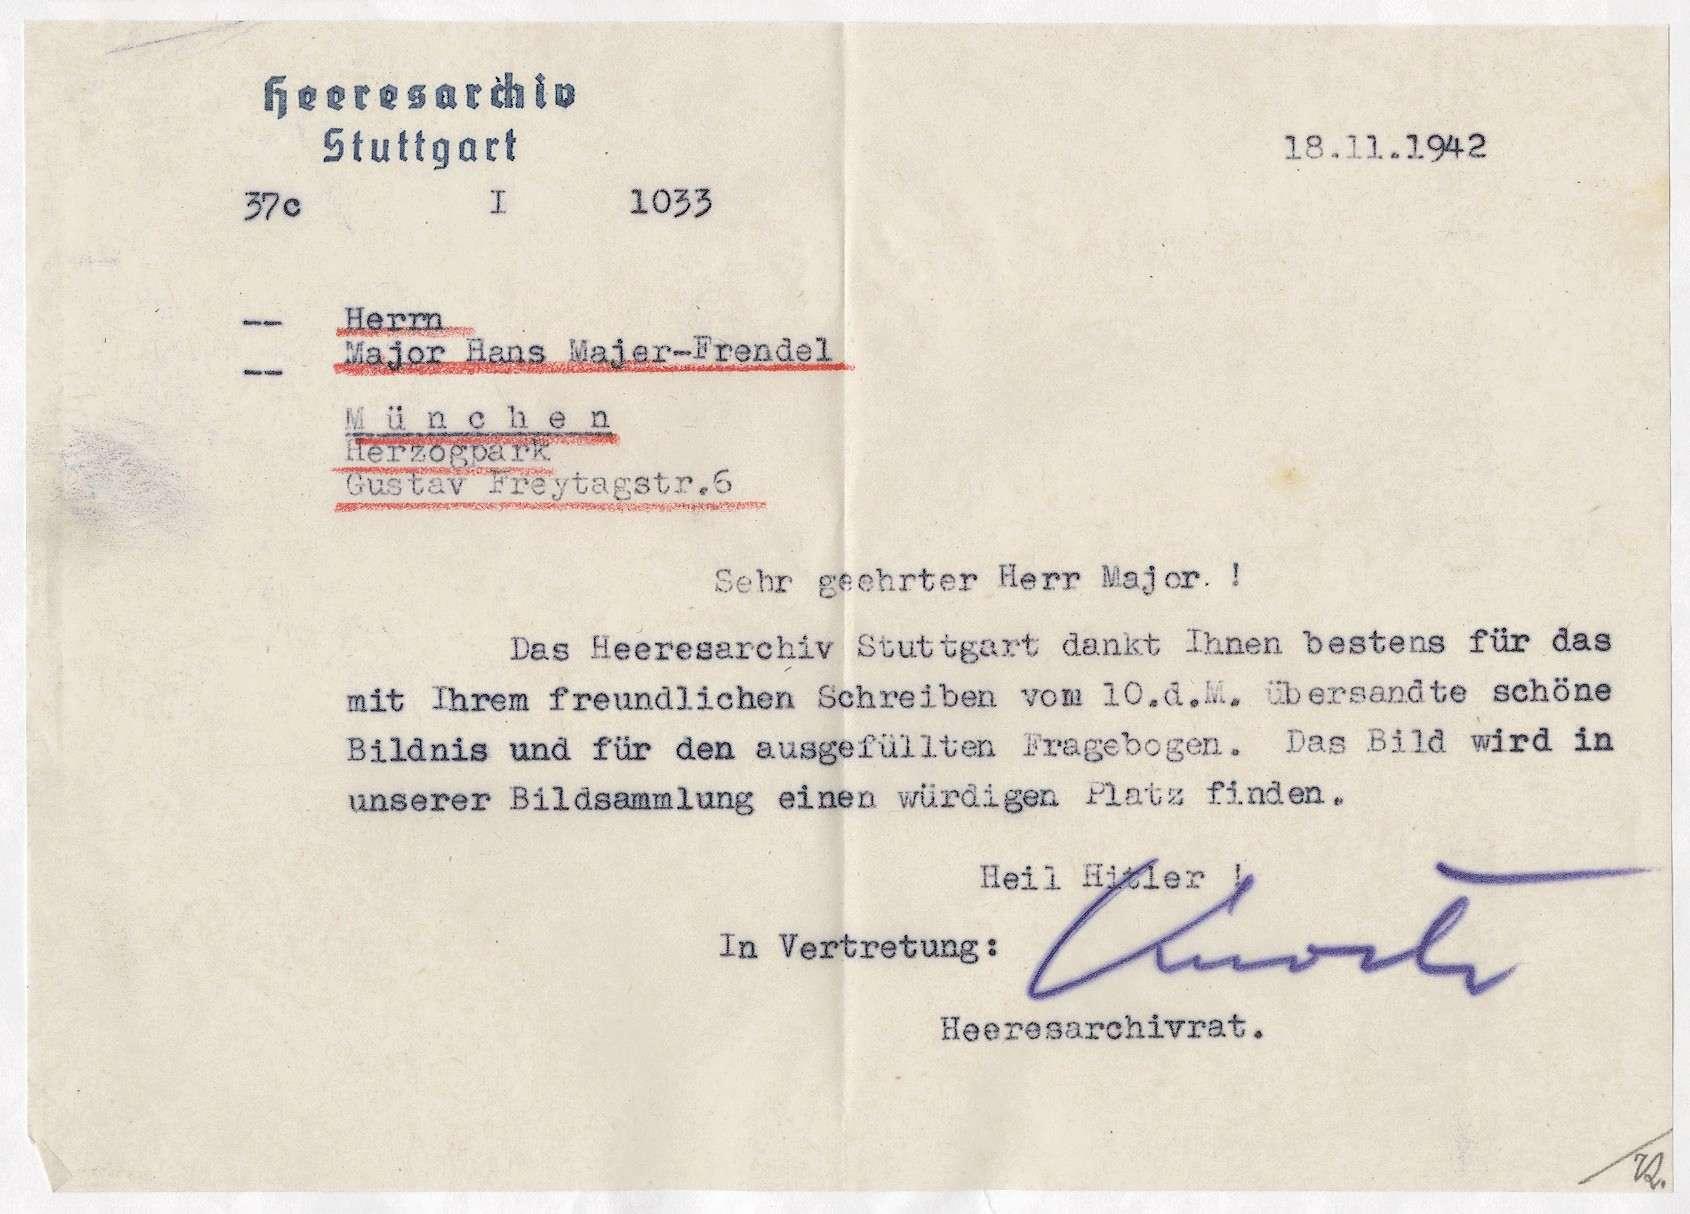 Majer-Frendel, Hans, Bild 3